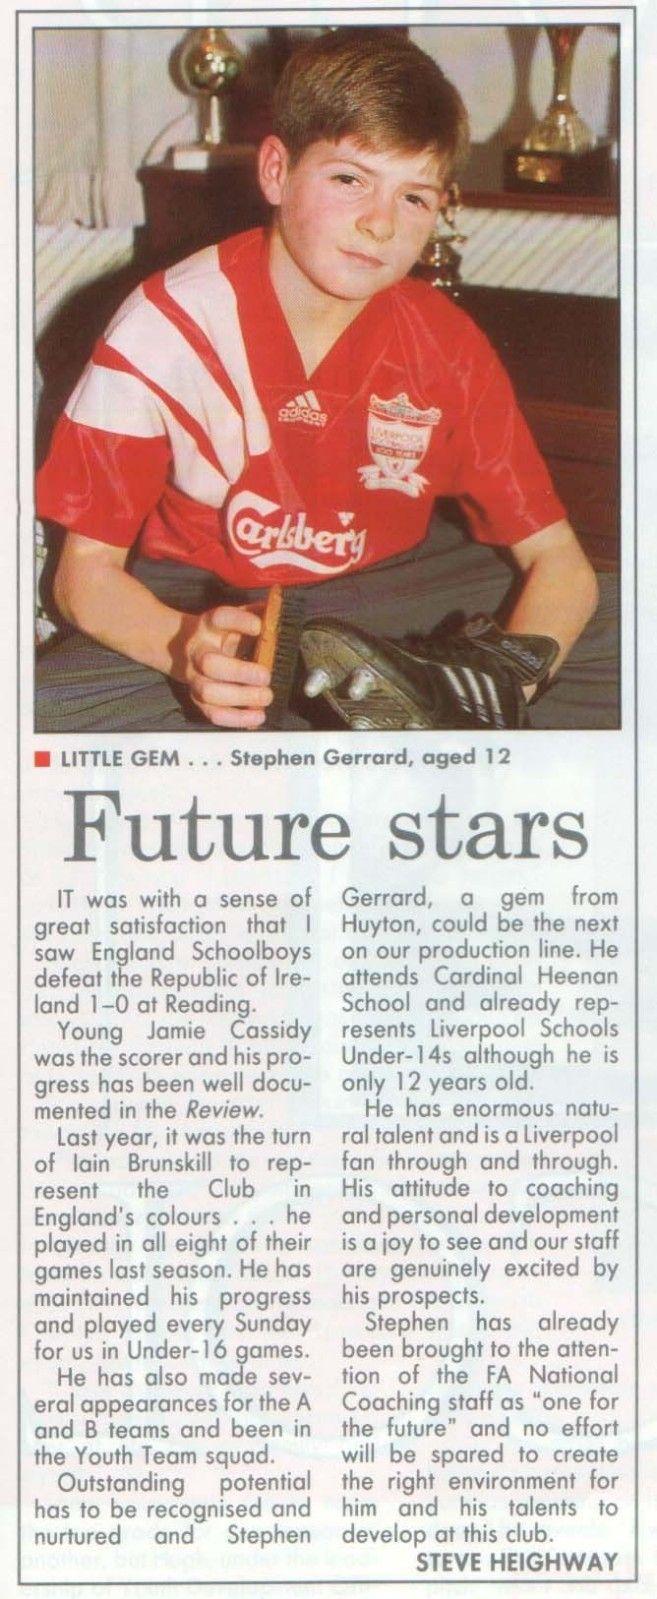 Future Stars... Stephen Gerrard, aged 12